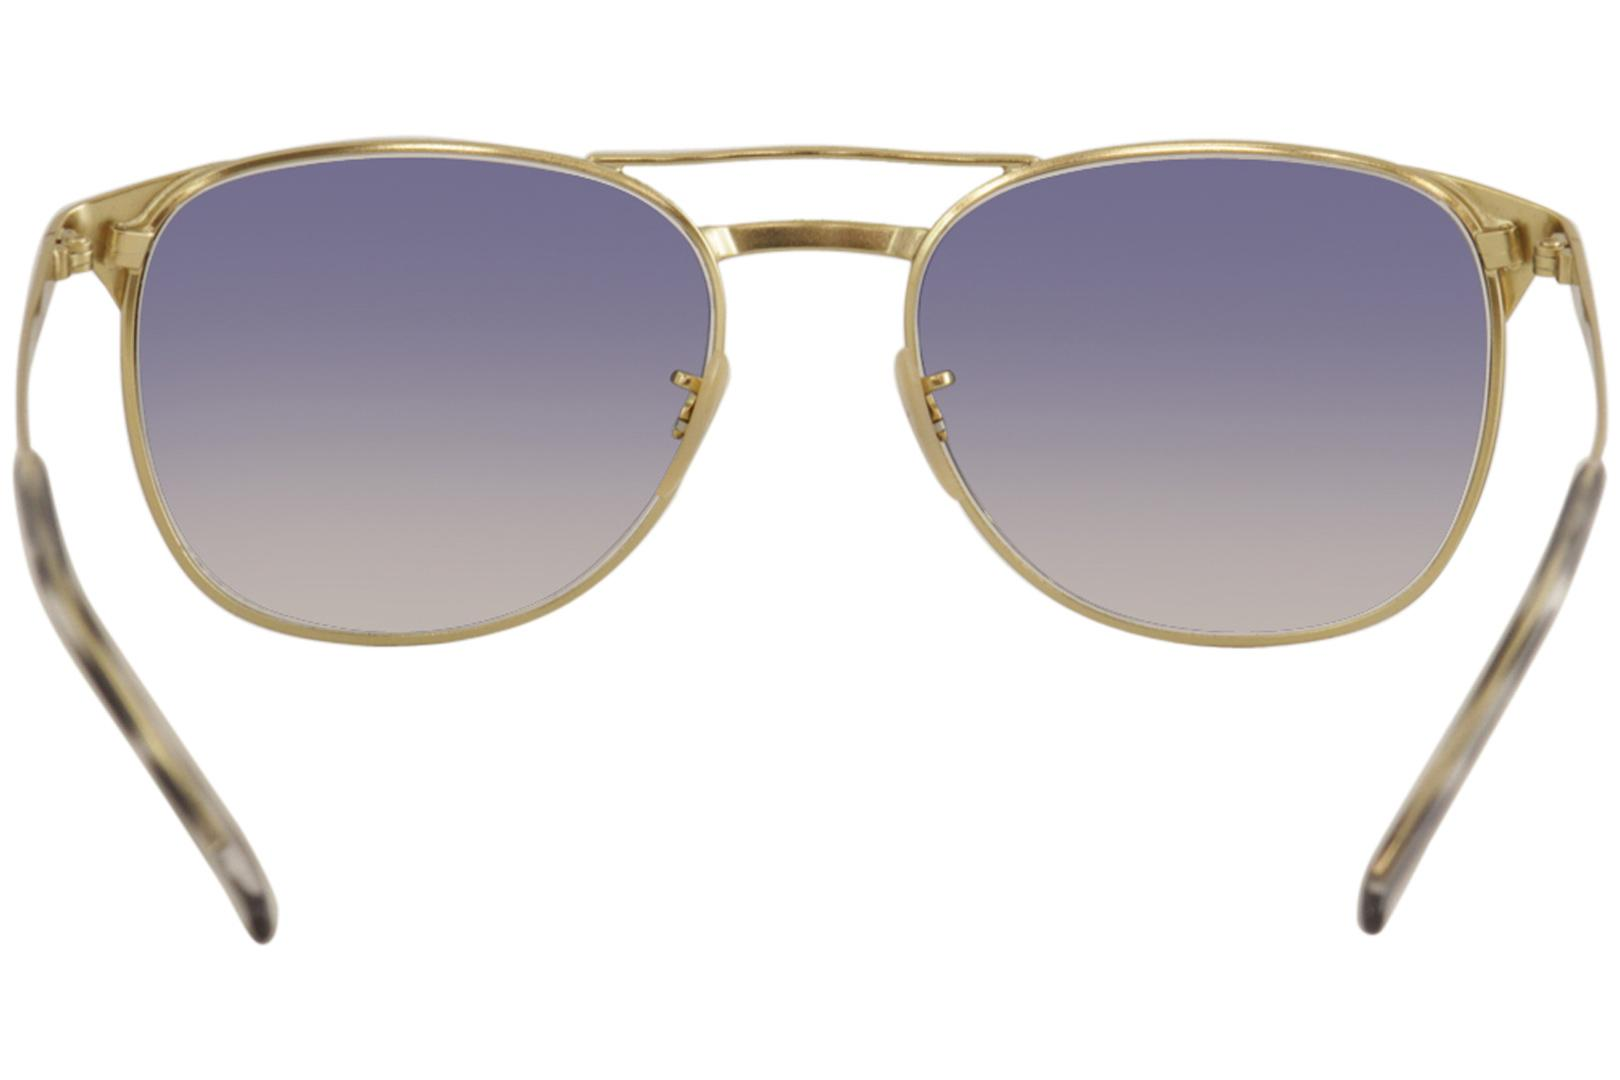 7e770305530f6 Ray Ban Men s Signet RB3429M RB 3429 M RayBan Fashion Pilot Sunglasses